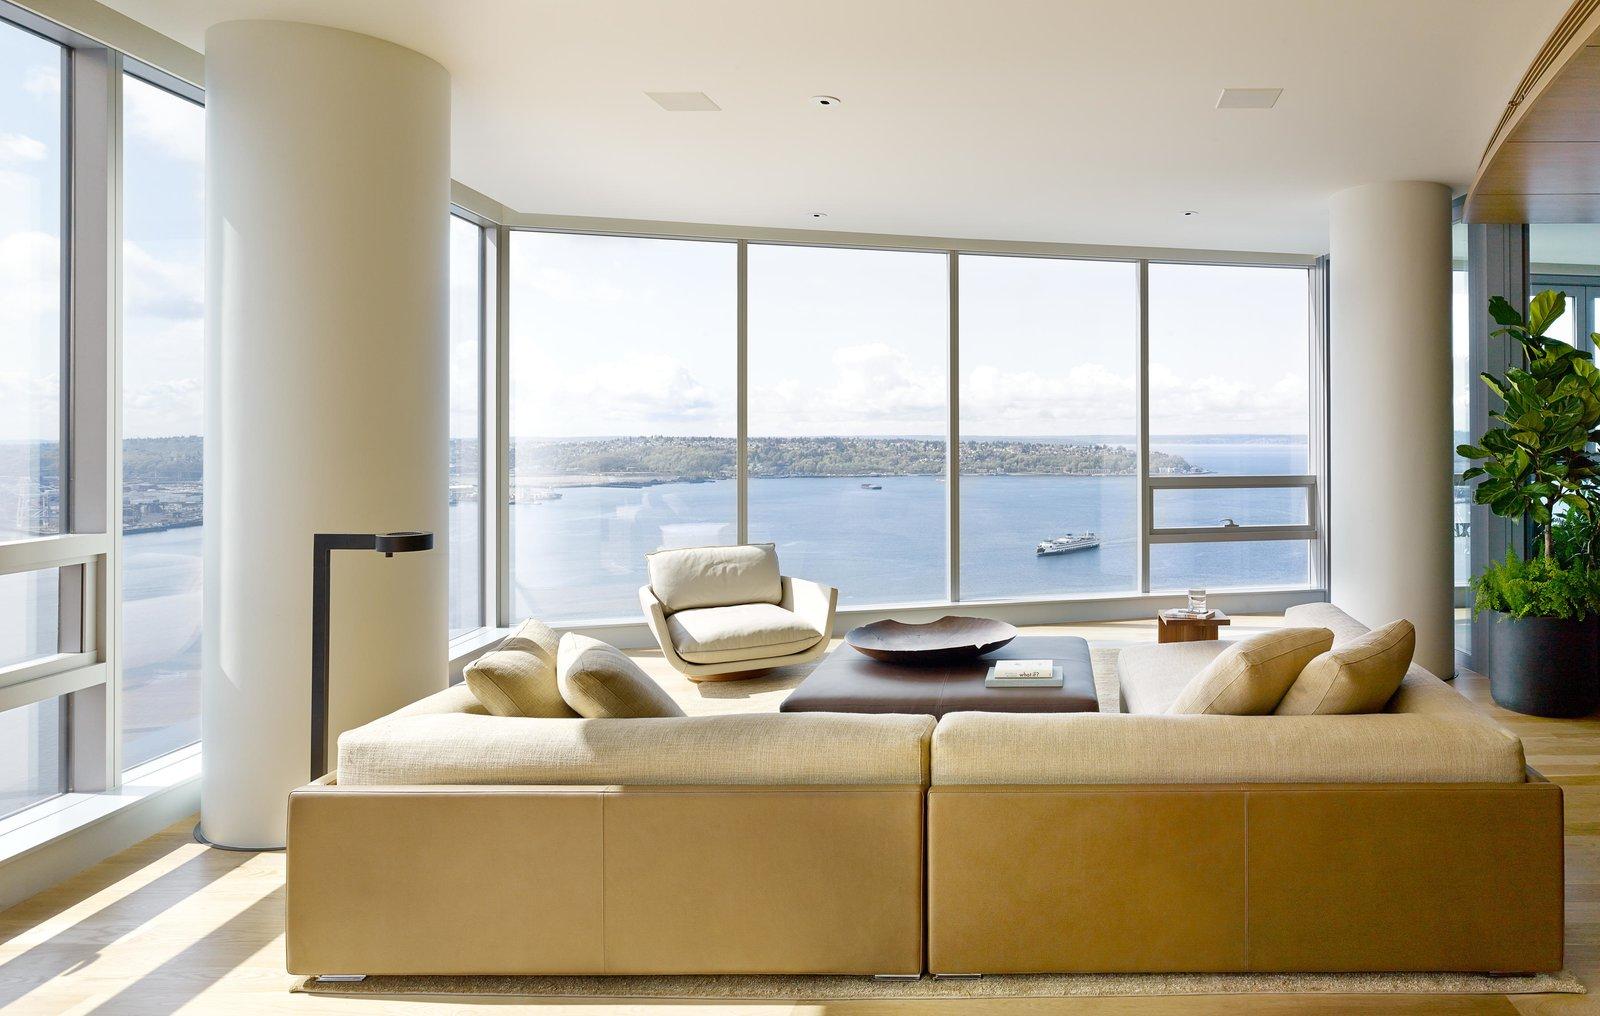 Living Room, Sectional, Coffee Tables, Sofa, and End Tables Harbor Loft | Olson Kundig  Harbor Loft by Olson Kundig